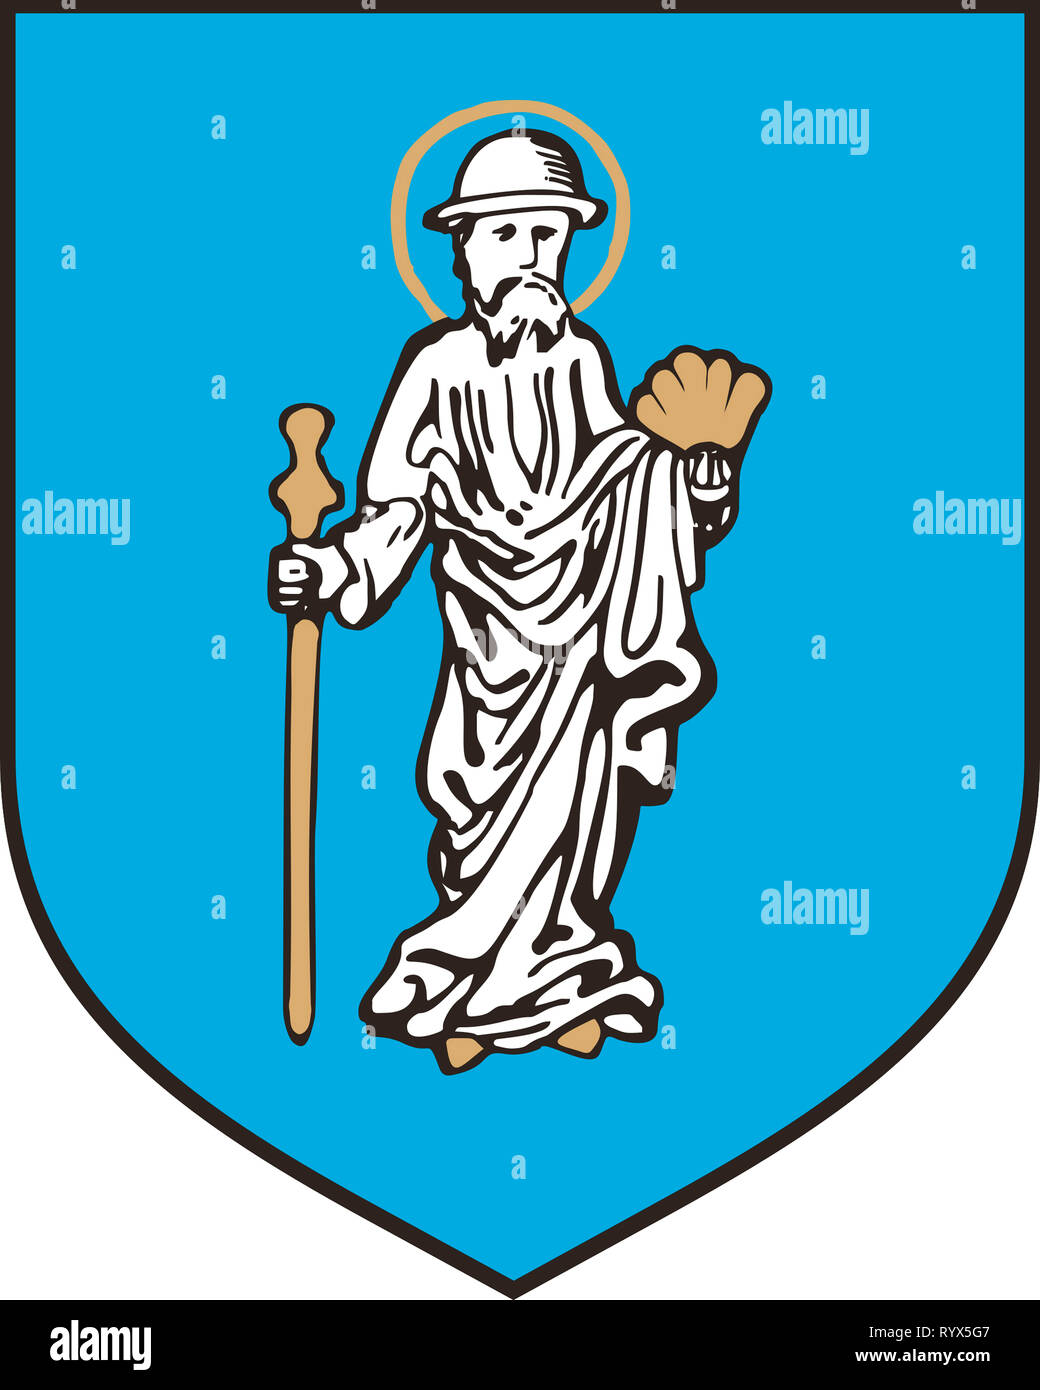 Coat of arms of the Polish city of Olsztyn - Poland. - Stock Image